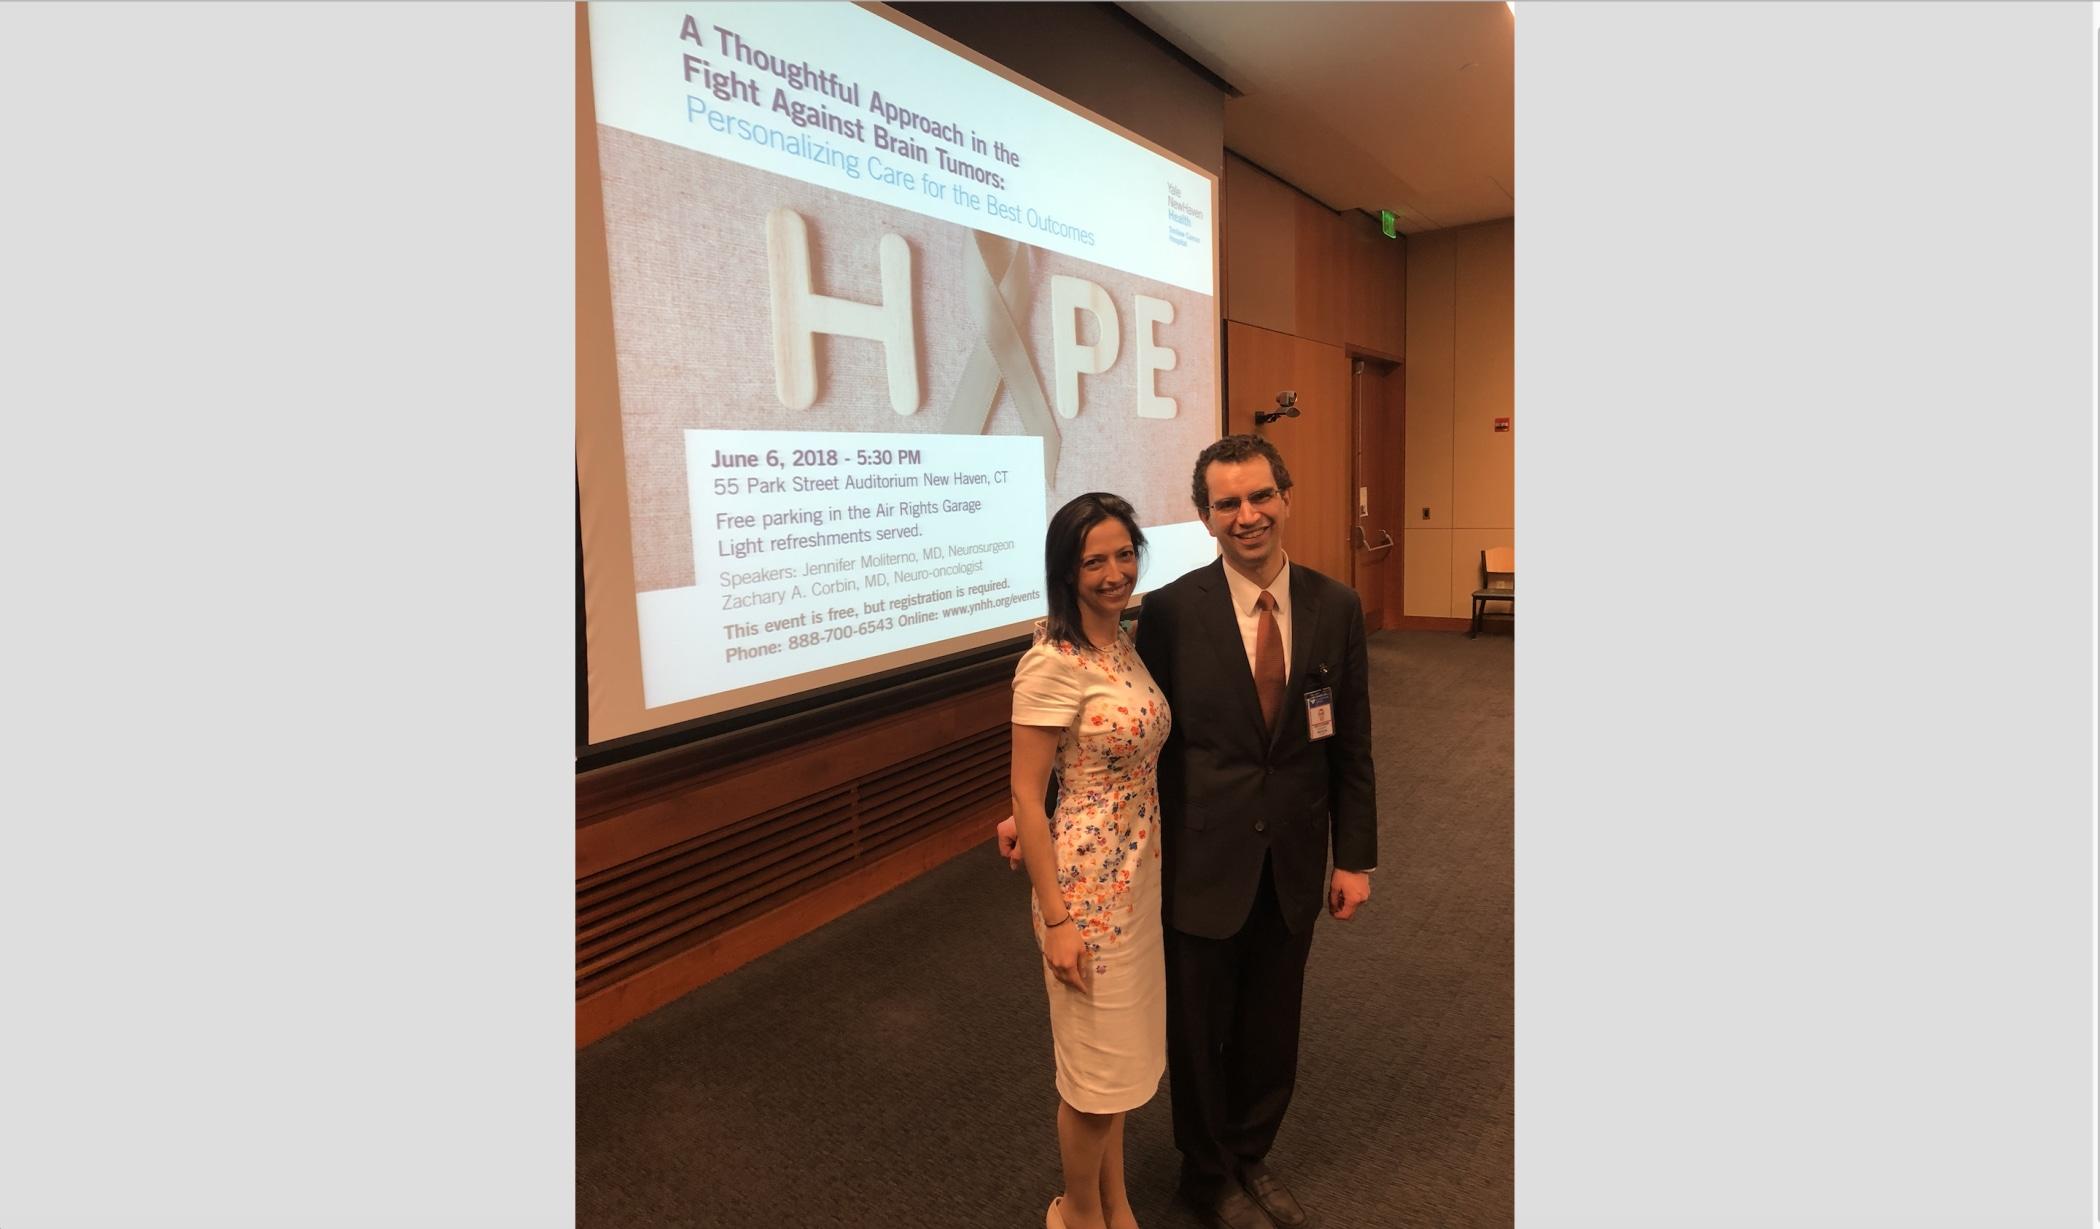 Dr. Jennifer Moliterno Gunel and Dr. Zachary Corbin